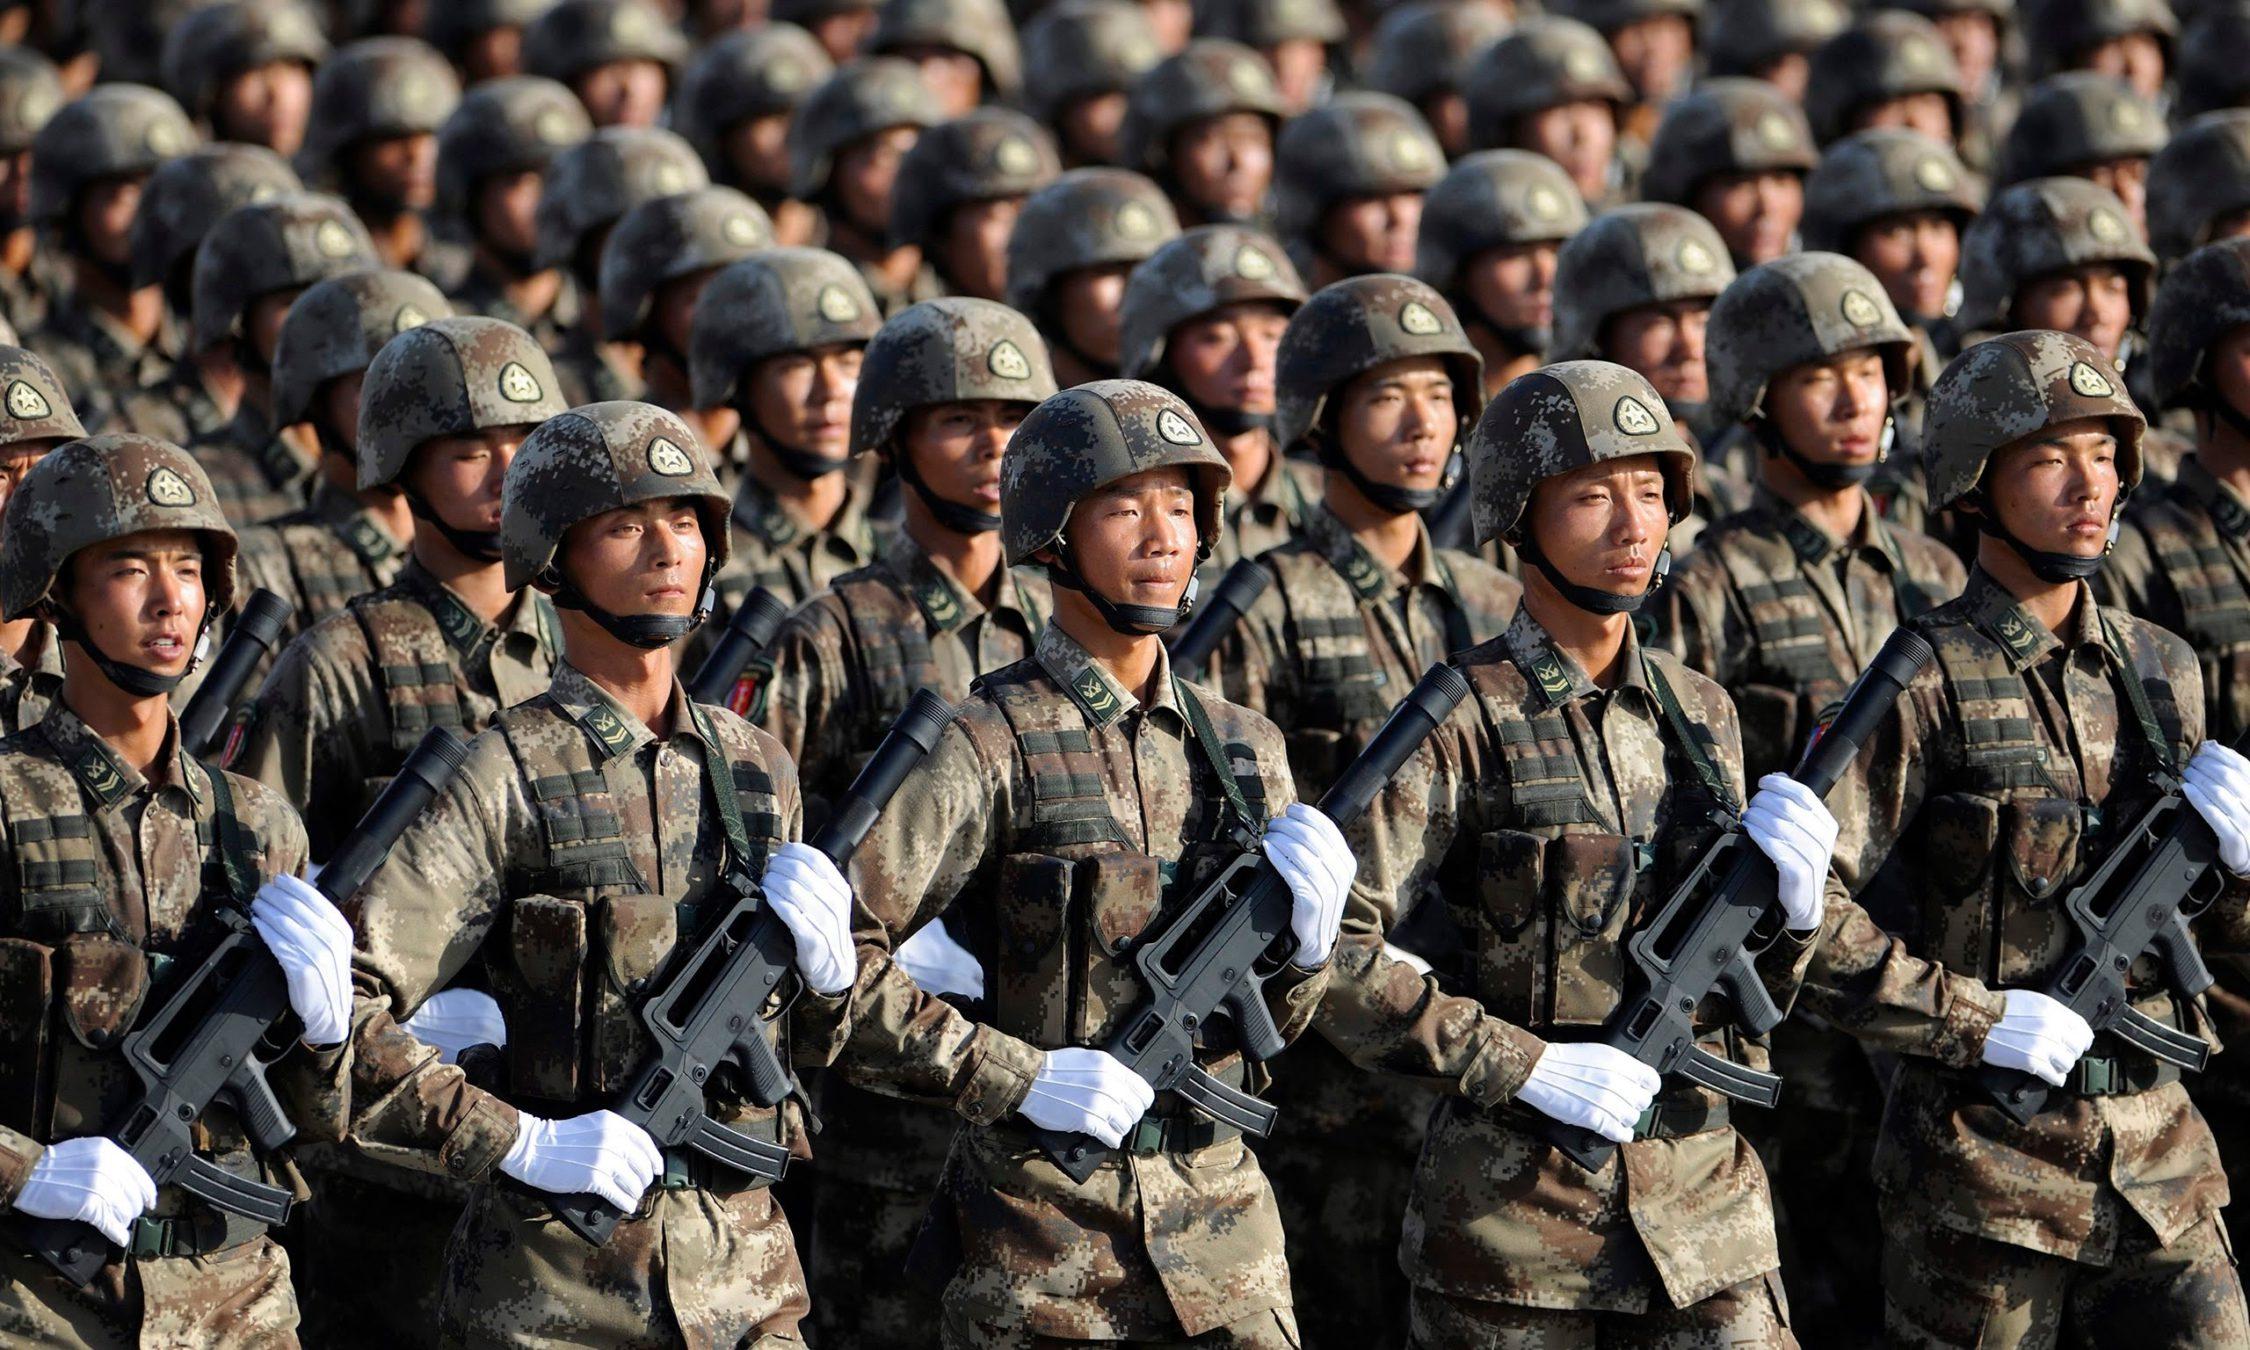 China anunció envío de fuerzas especiales a Siria